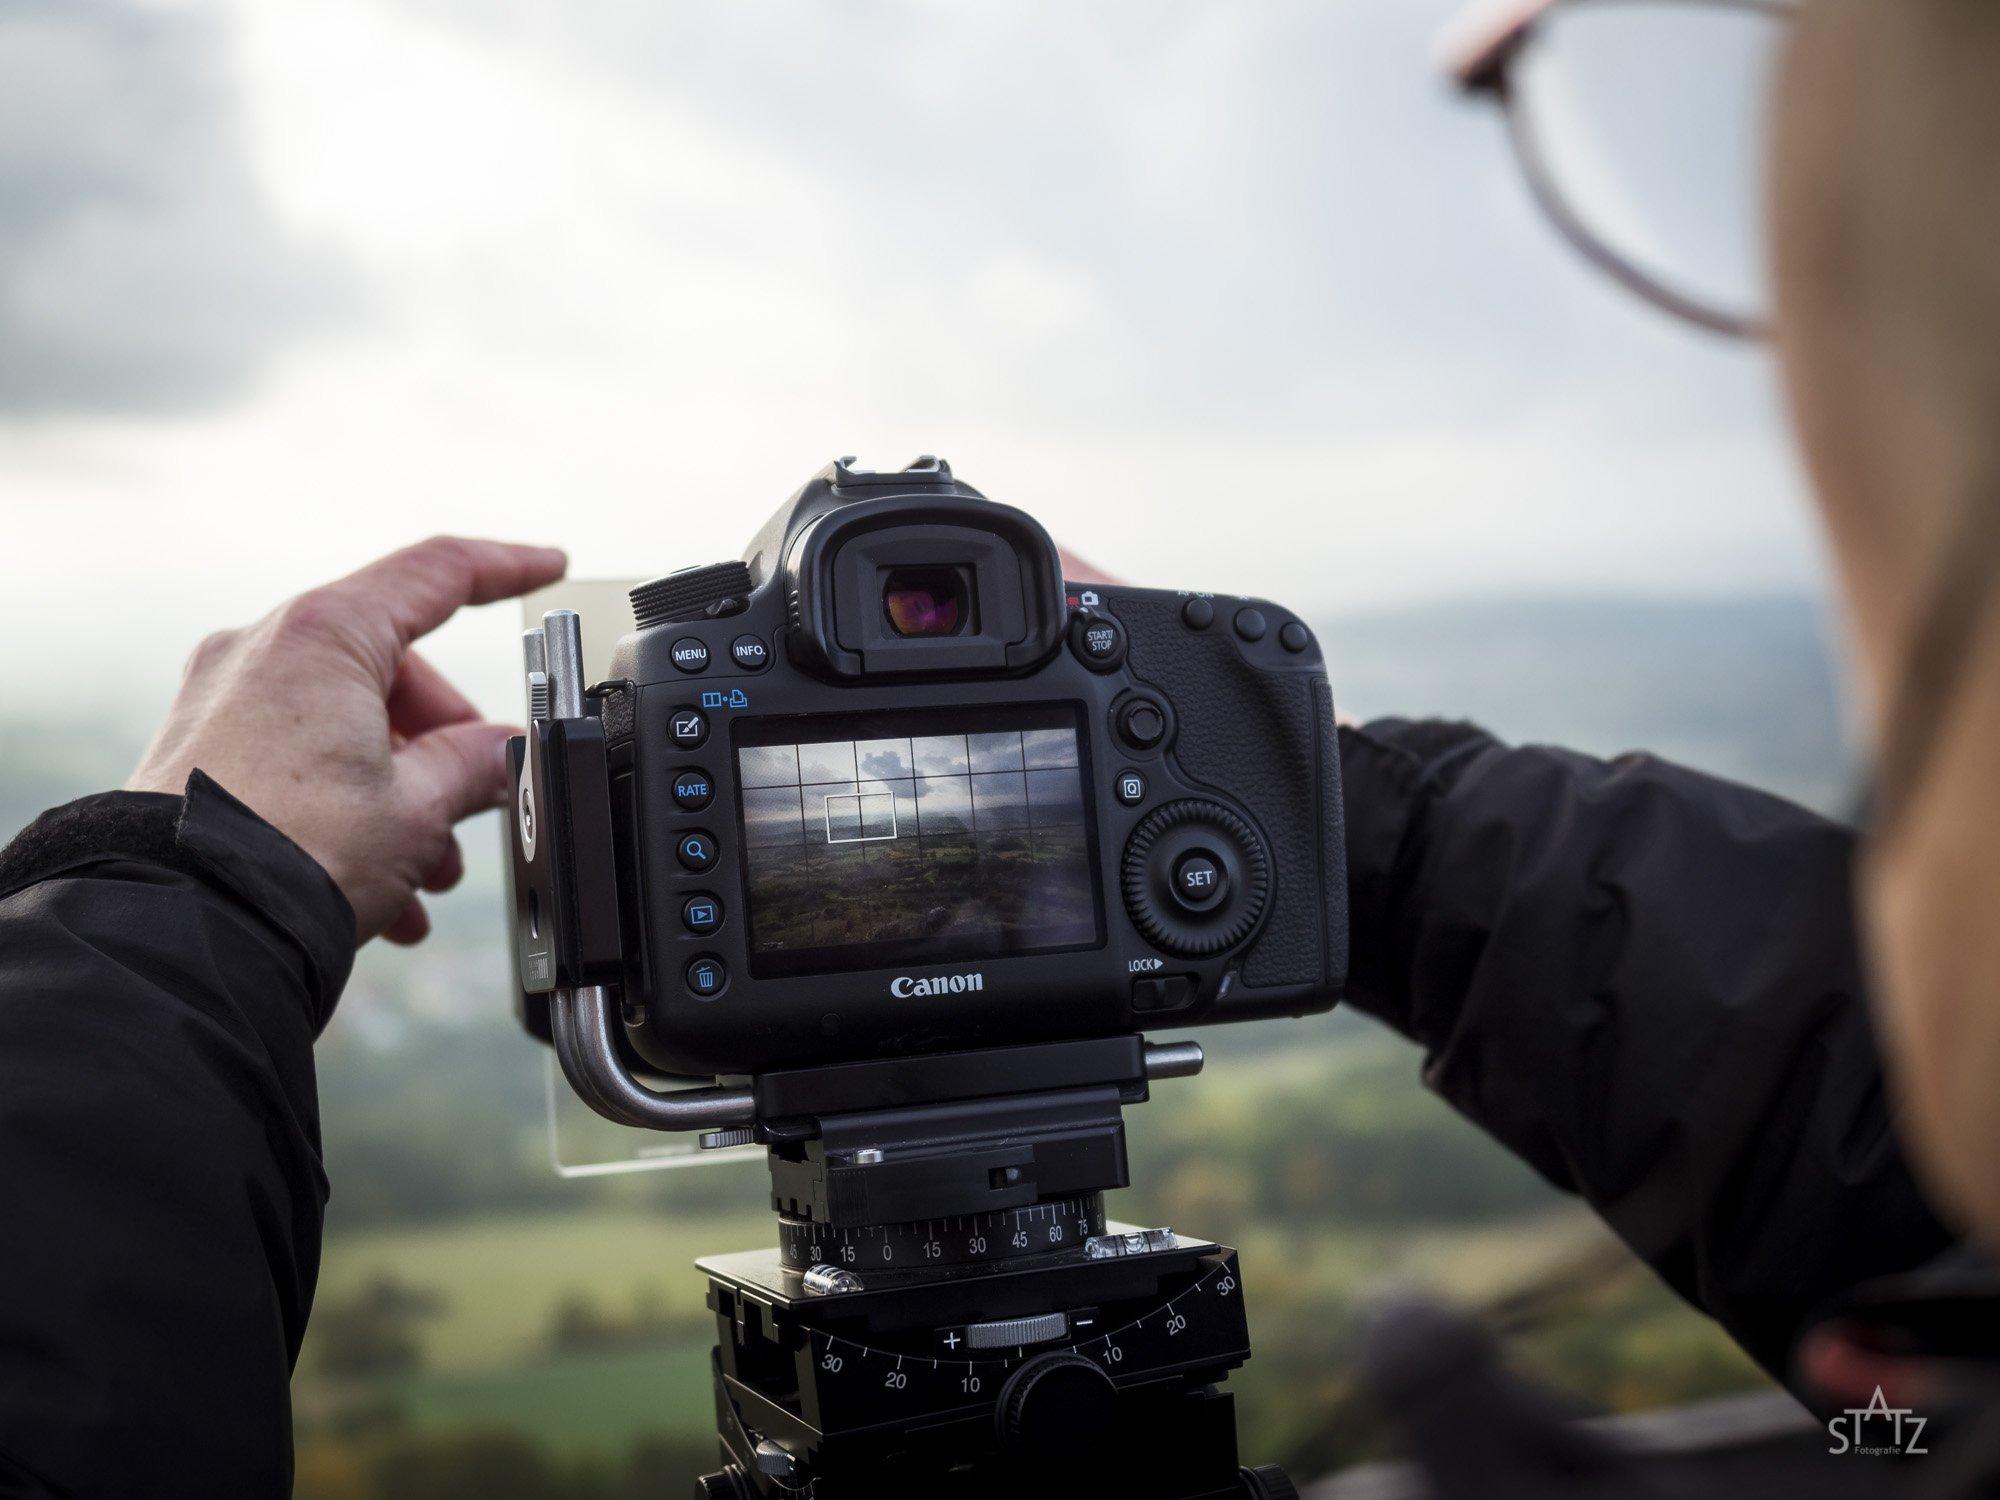 Olympus Landschaftsfotografie Workshop fotogena Akademie